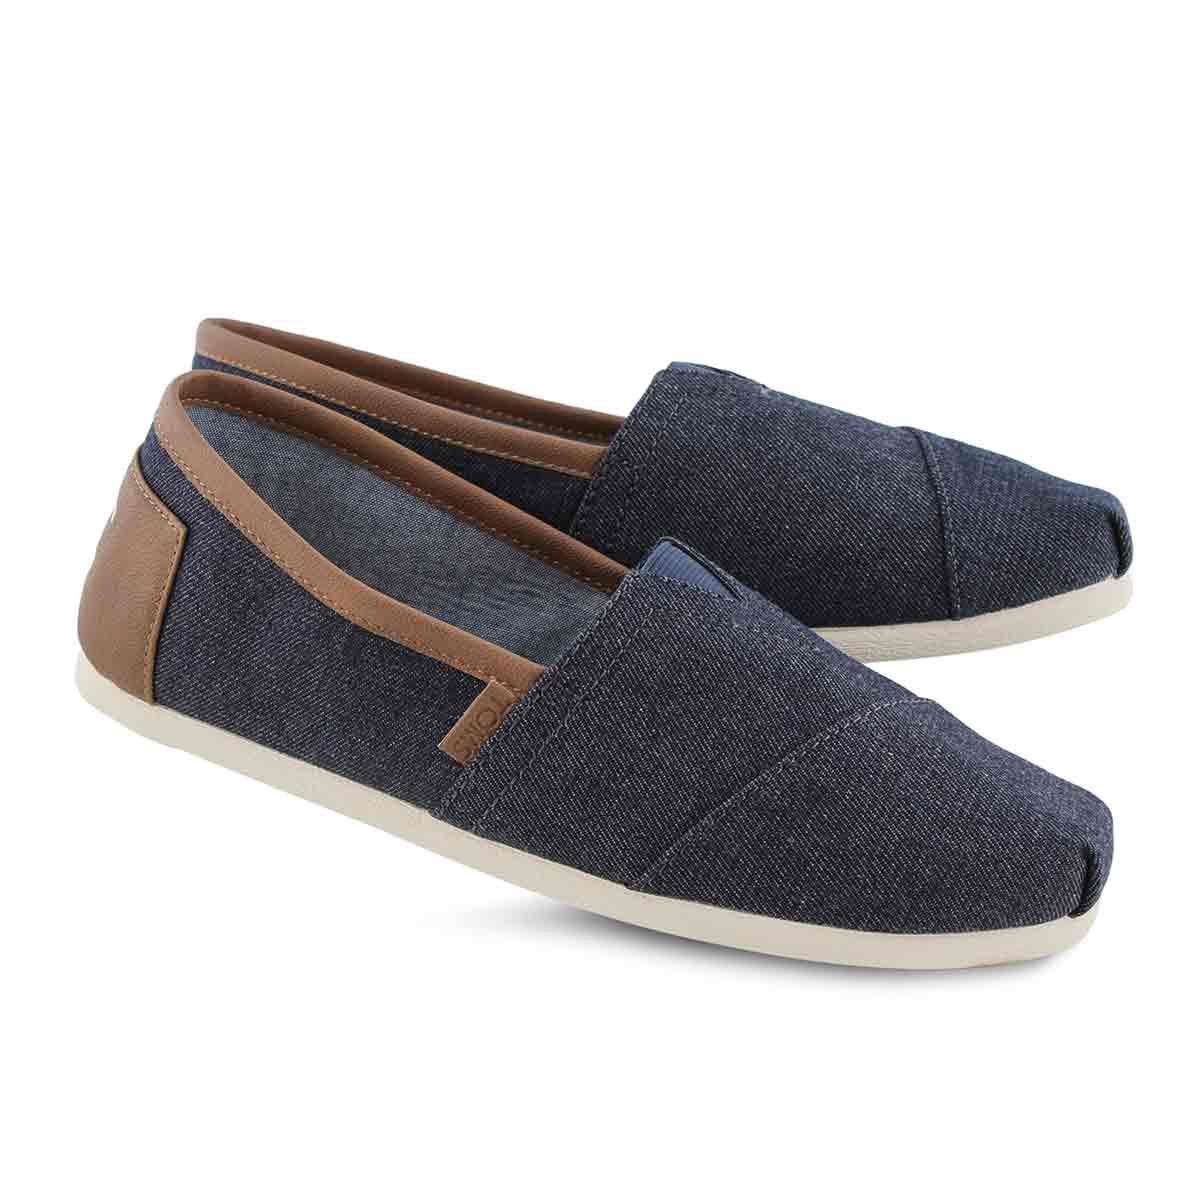 Mns Classic Lthr Trim denm casual loafer